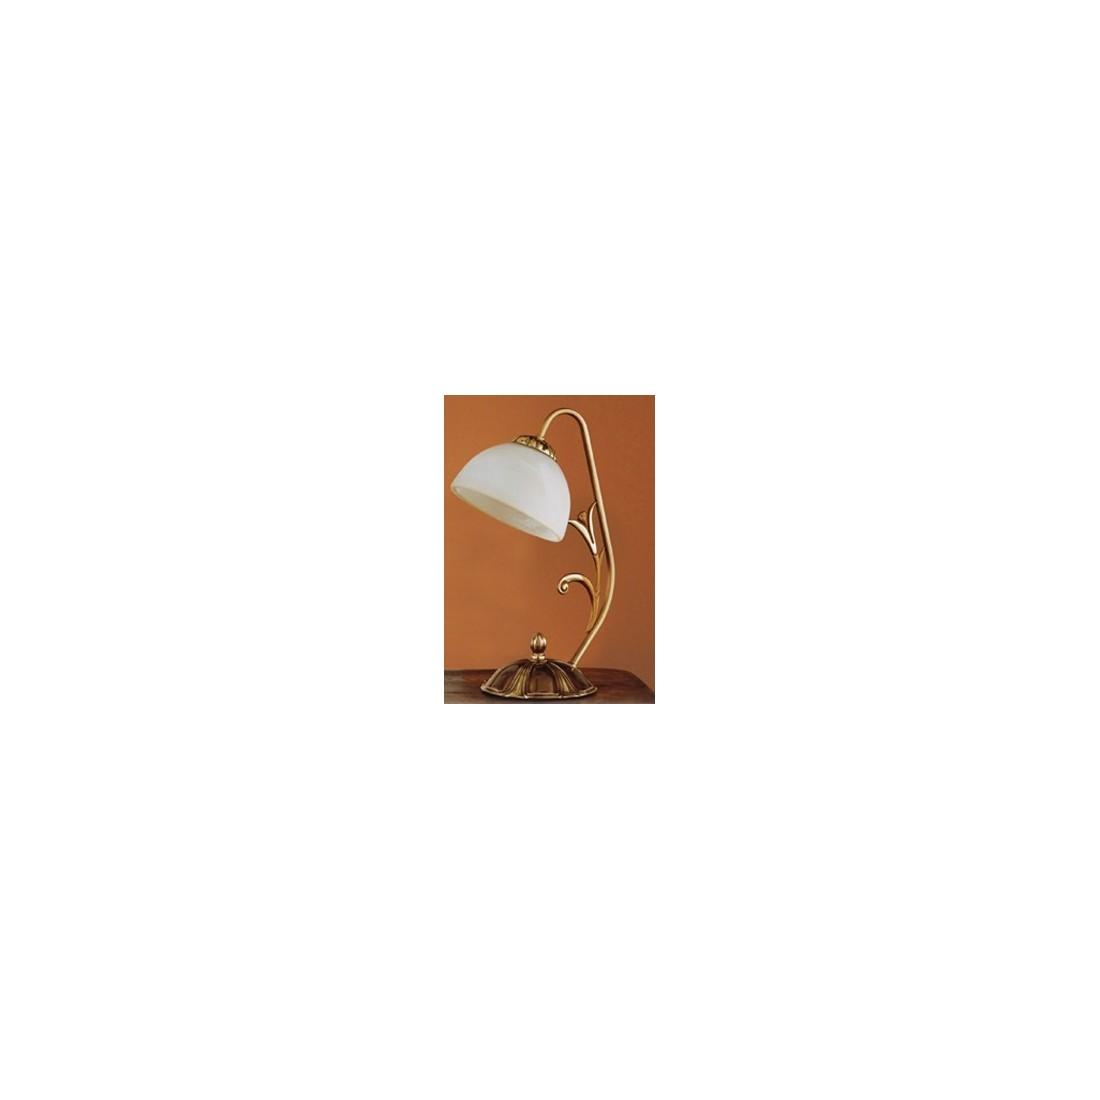 Luces de techo de bronce cl sicas con dragones - Lamparas clasicas modernas ...